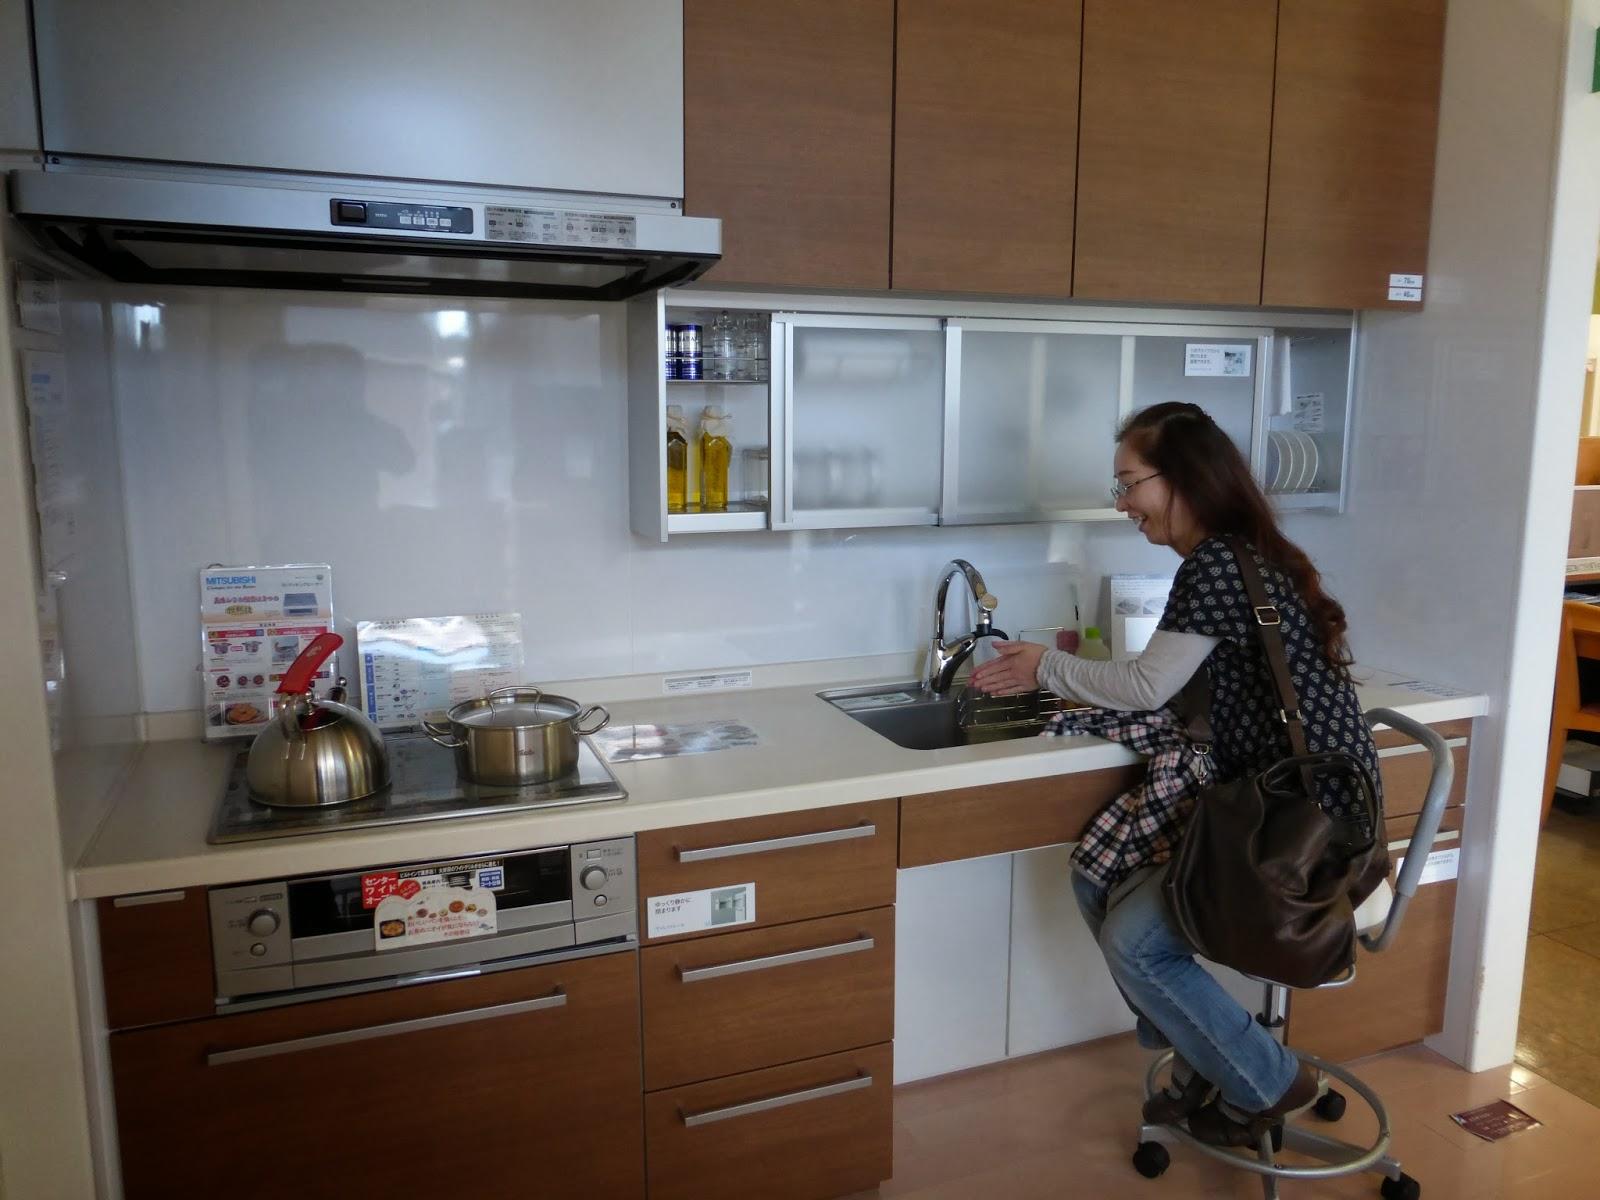 sashiko and other stitching: Yamagata - new kitchen ideas!